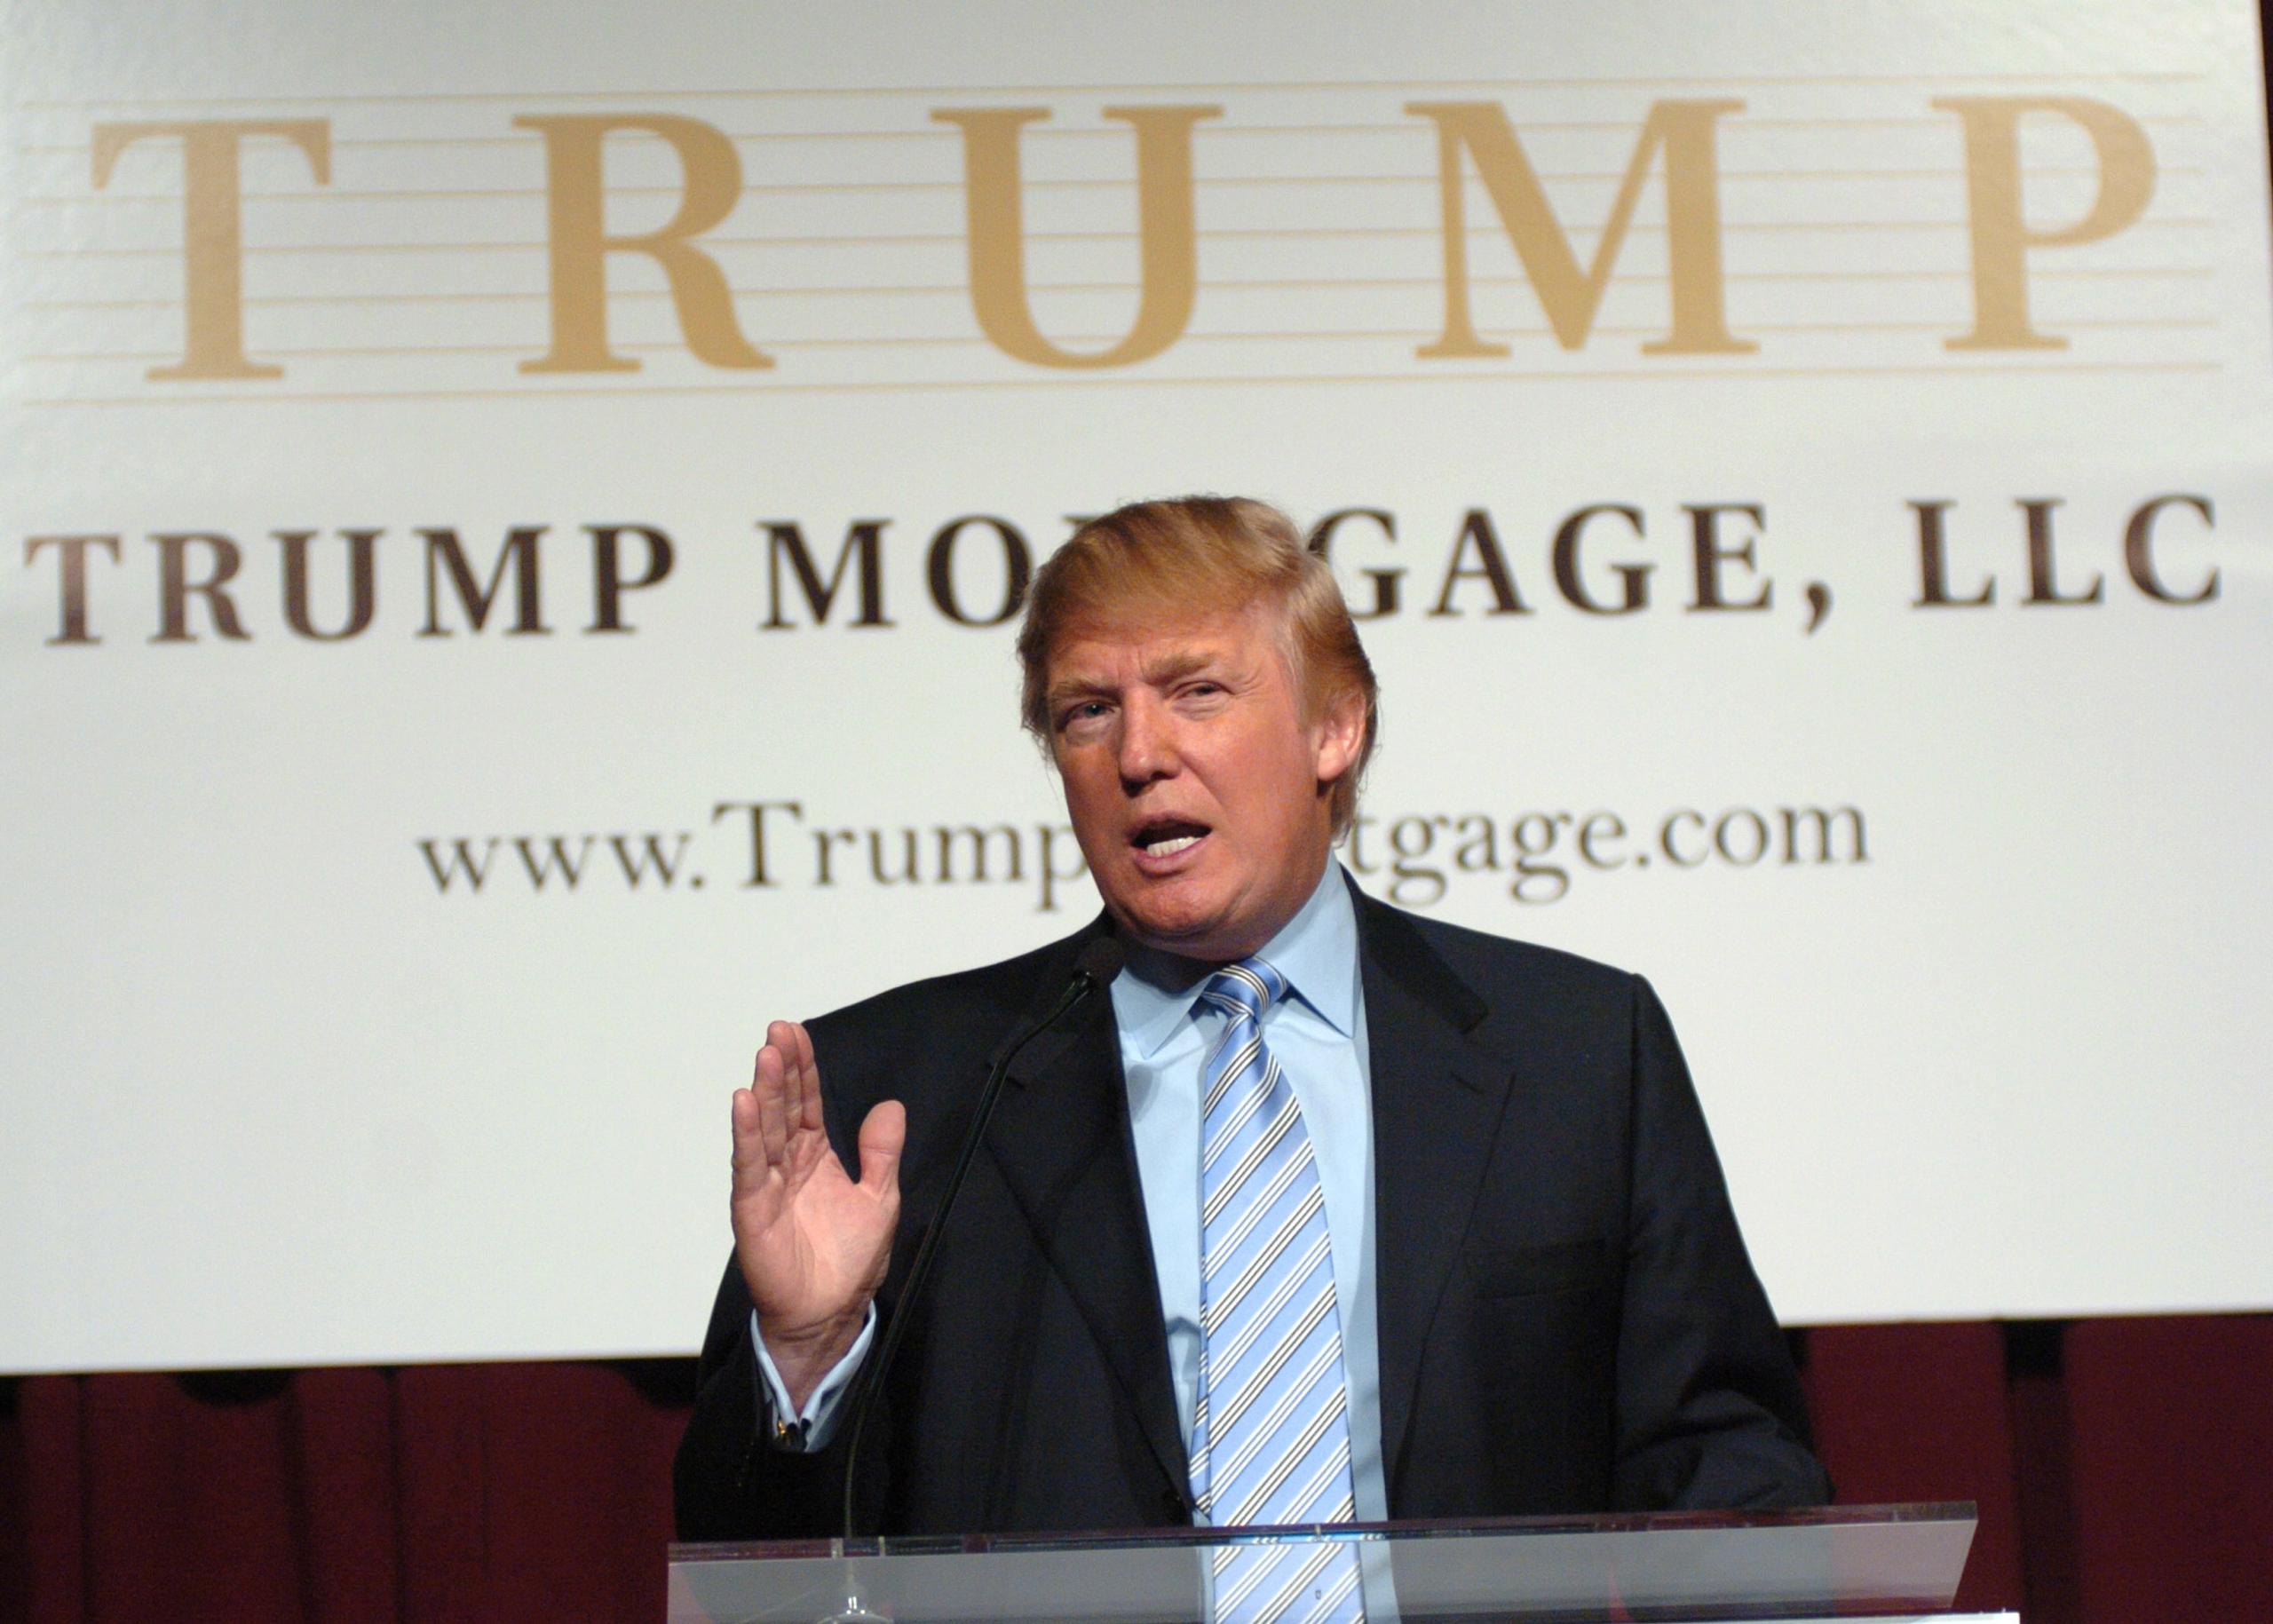 Donald Trump during Donald Trump New York City Press Launch For Latest Venture Trump Mortgage LLC at Trump Tower in New York City, New York, United States. (Photo by J. Kempin/FilmMagic)